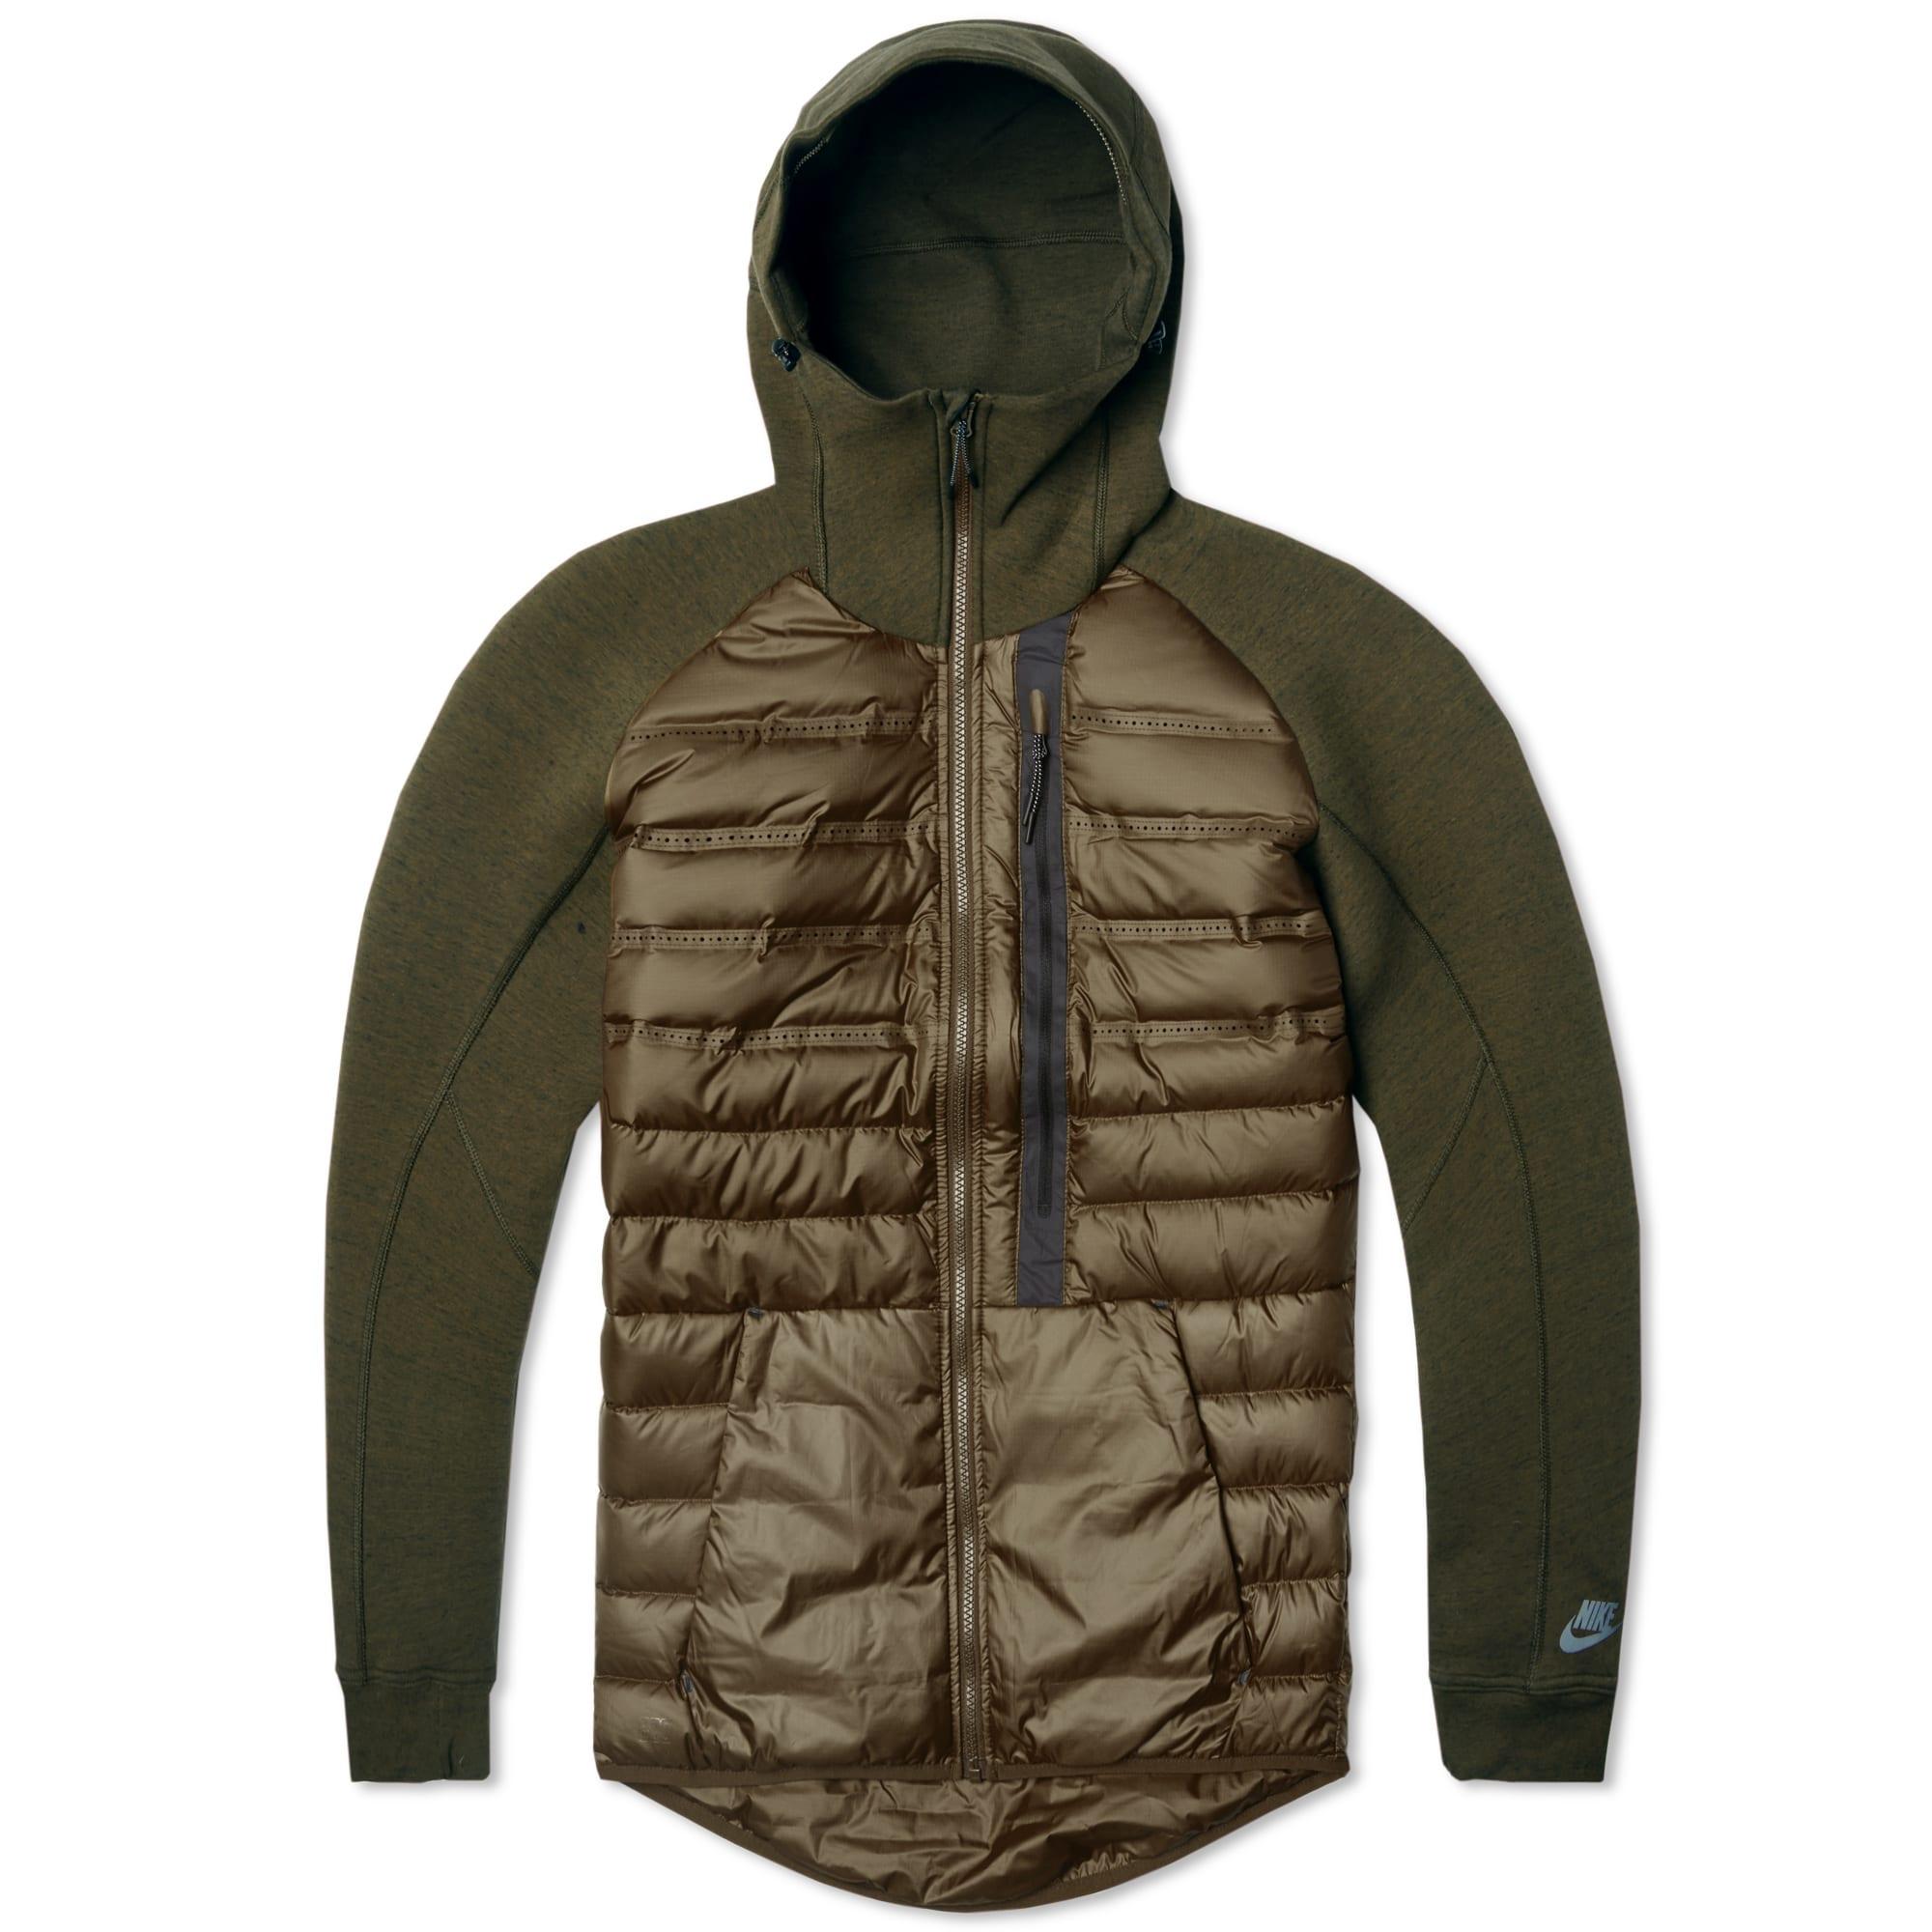 nike tech fleece aeroloft jacket dark loden cargo khaki. Black Bedroom Furniture Sets. Home Design Ideas